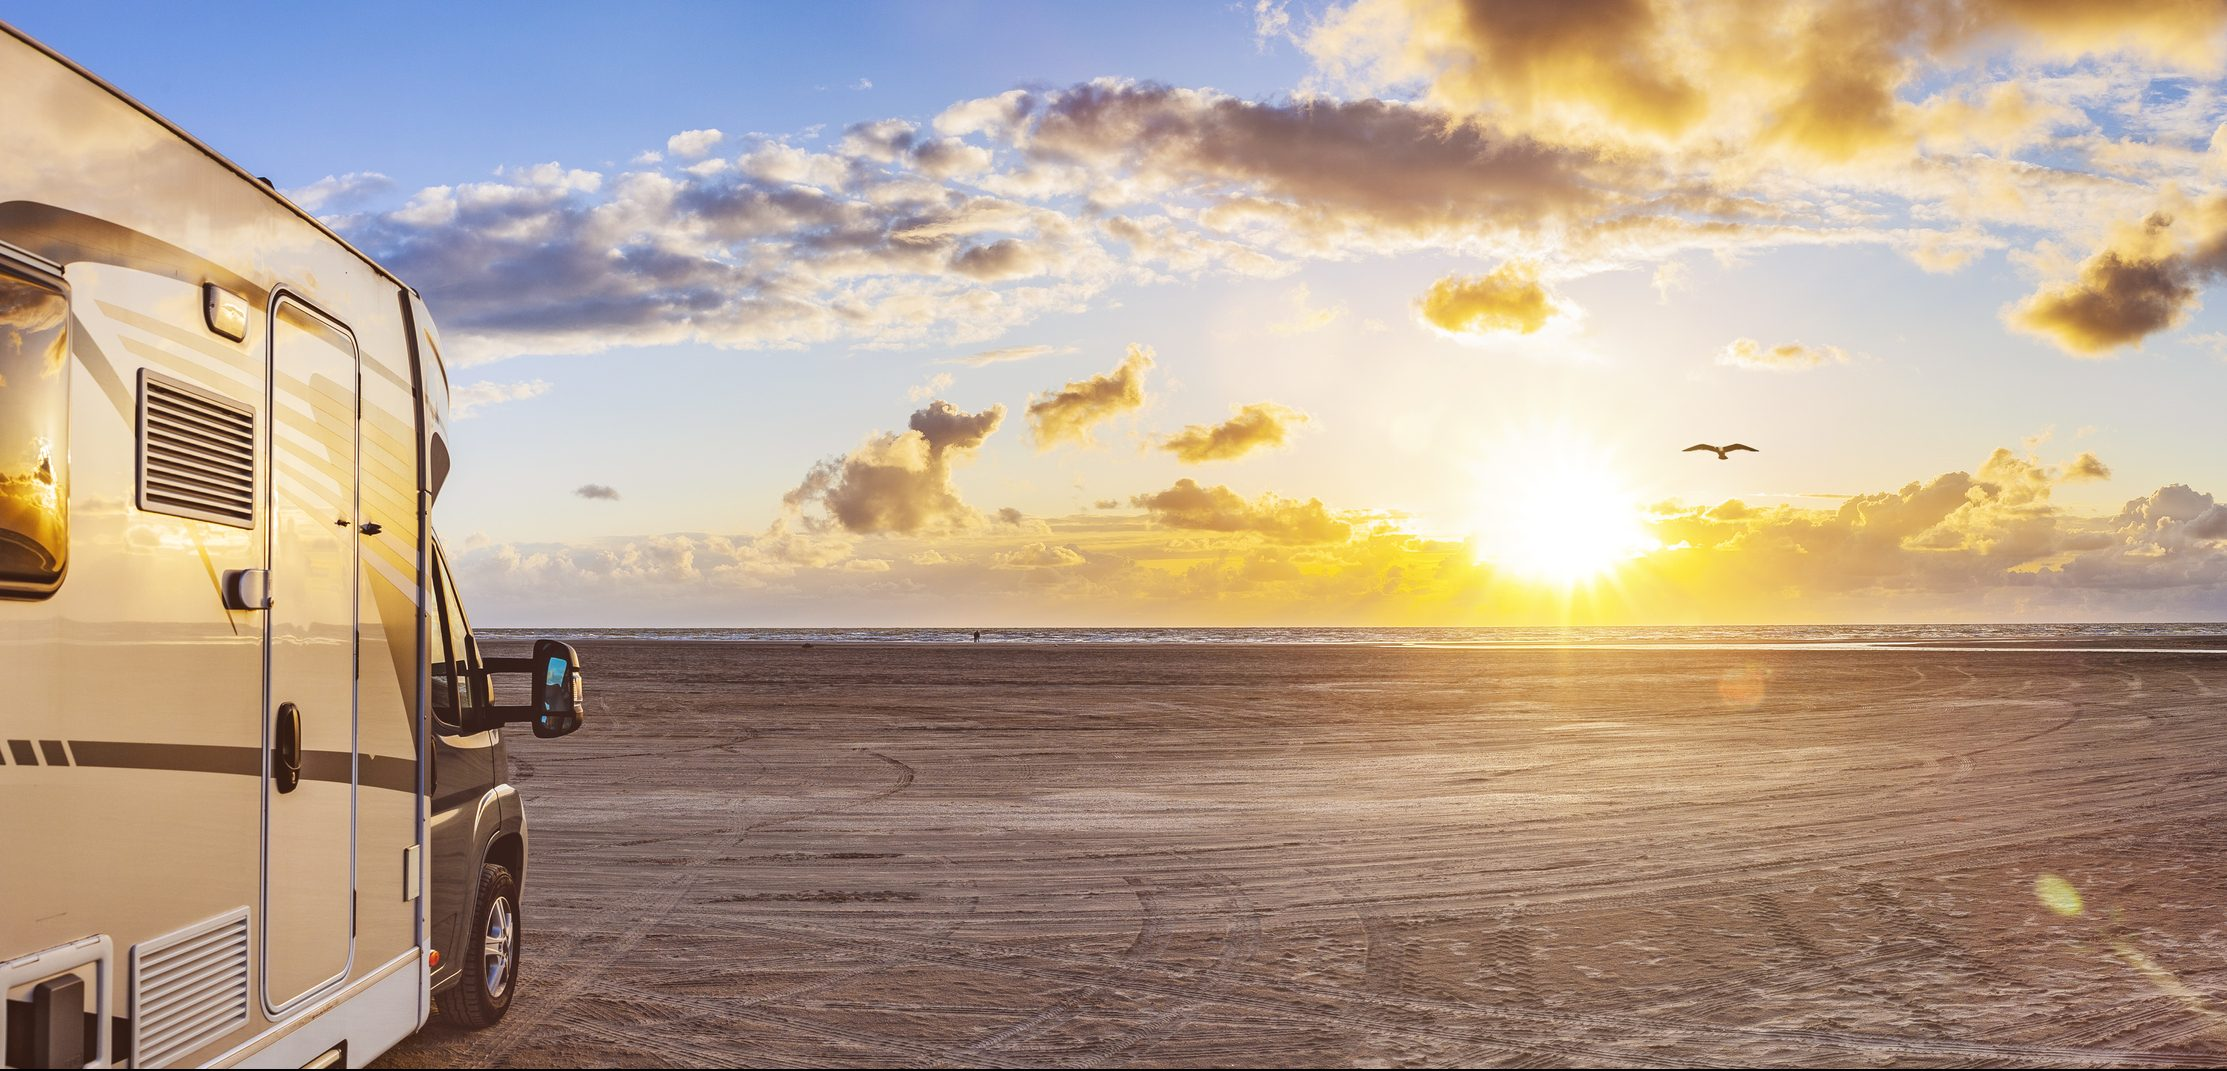 Motorhome facing the ocean at sunset